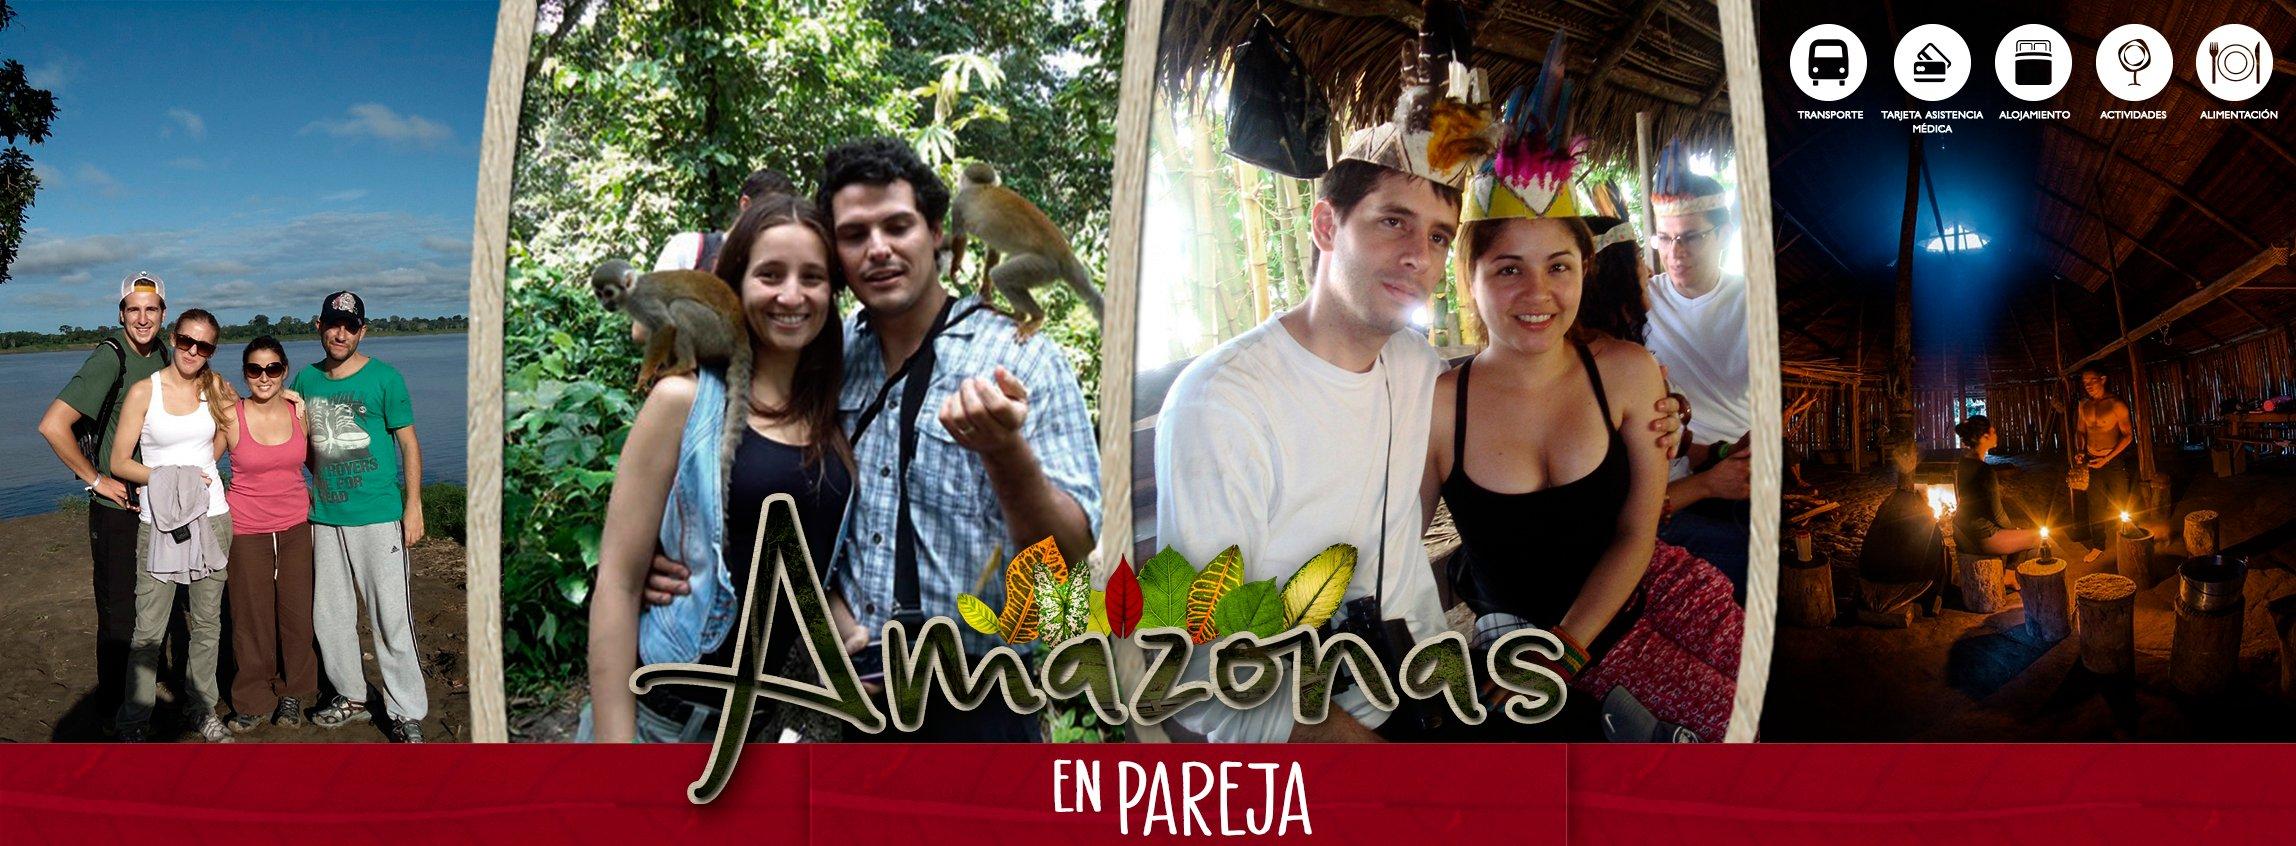 Planes en pareja Amazonas